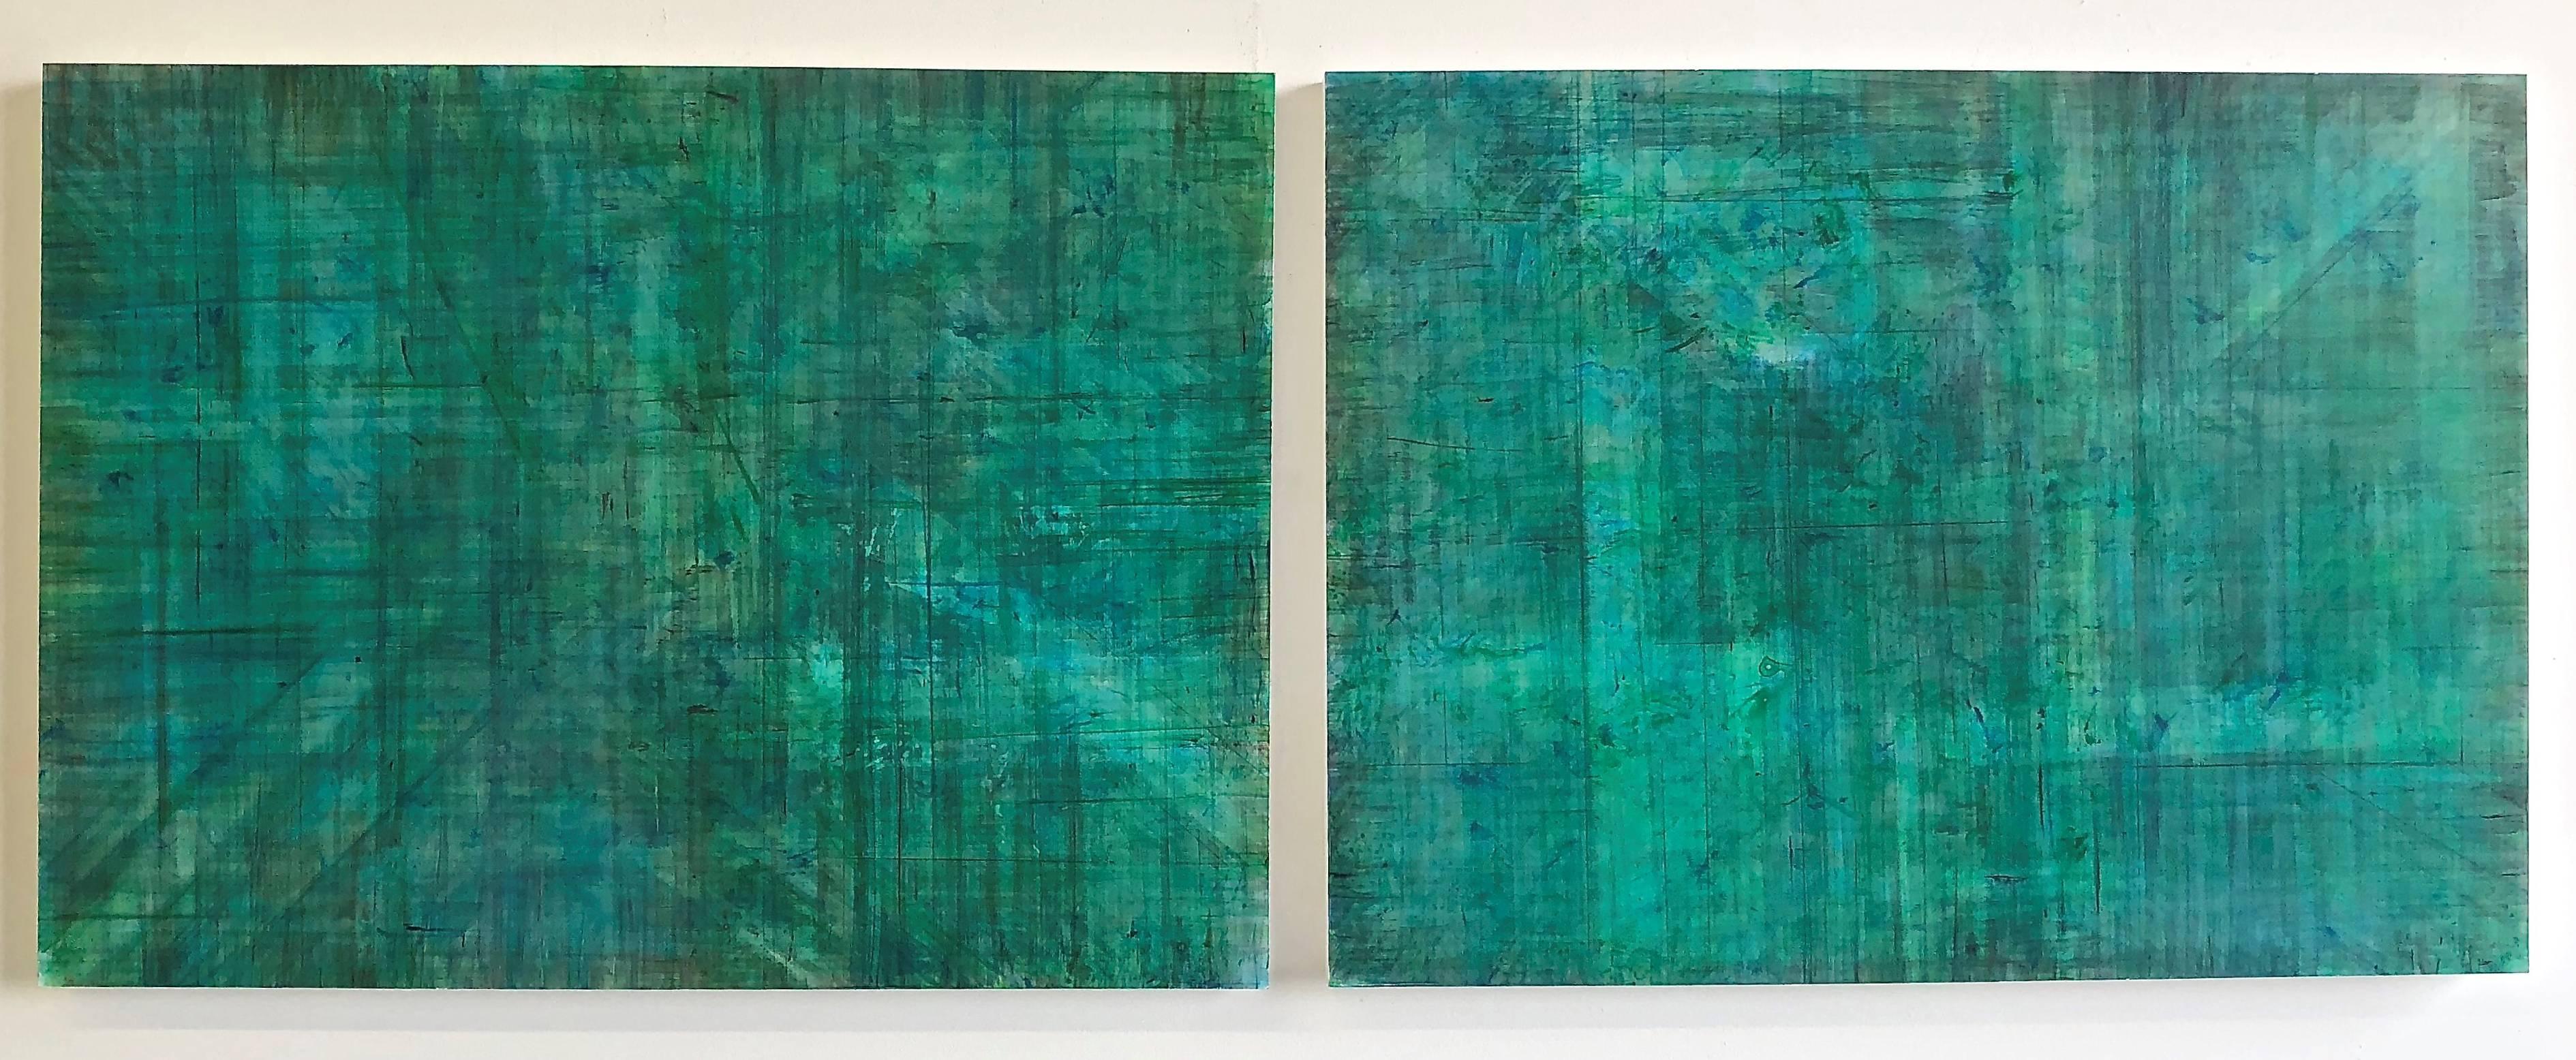 C15-1 (Minimalist Emerald Wall Sculpture on Two Panels)